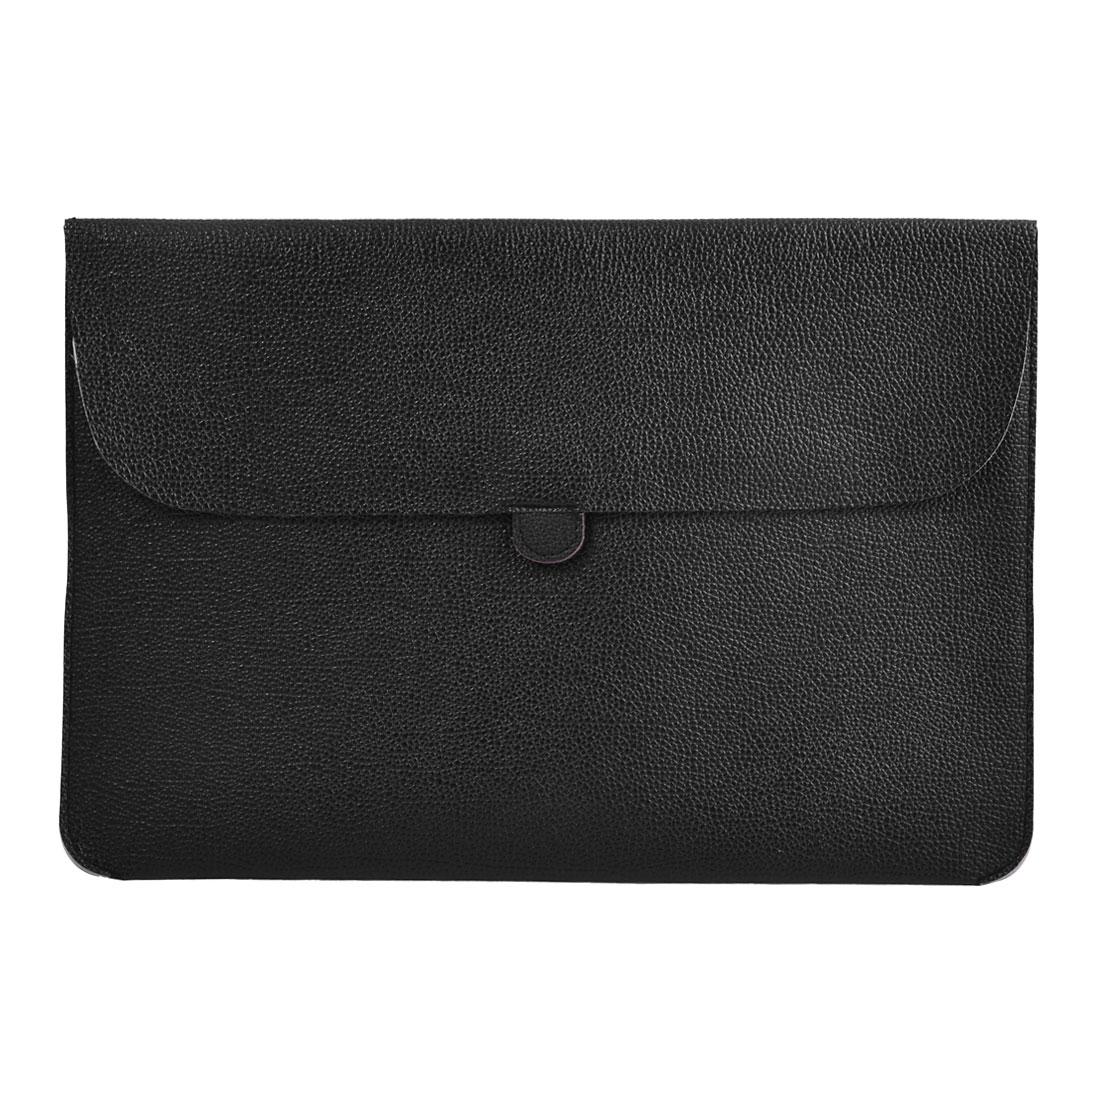 "Carrying Laptop Case Pouch Envelope Shape Tablet Sleeve Bag Black for Macbook 13.3"""